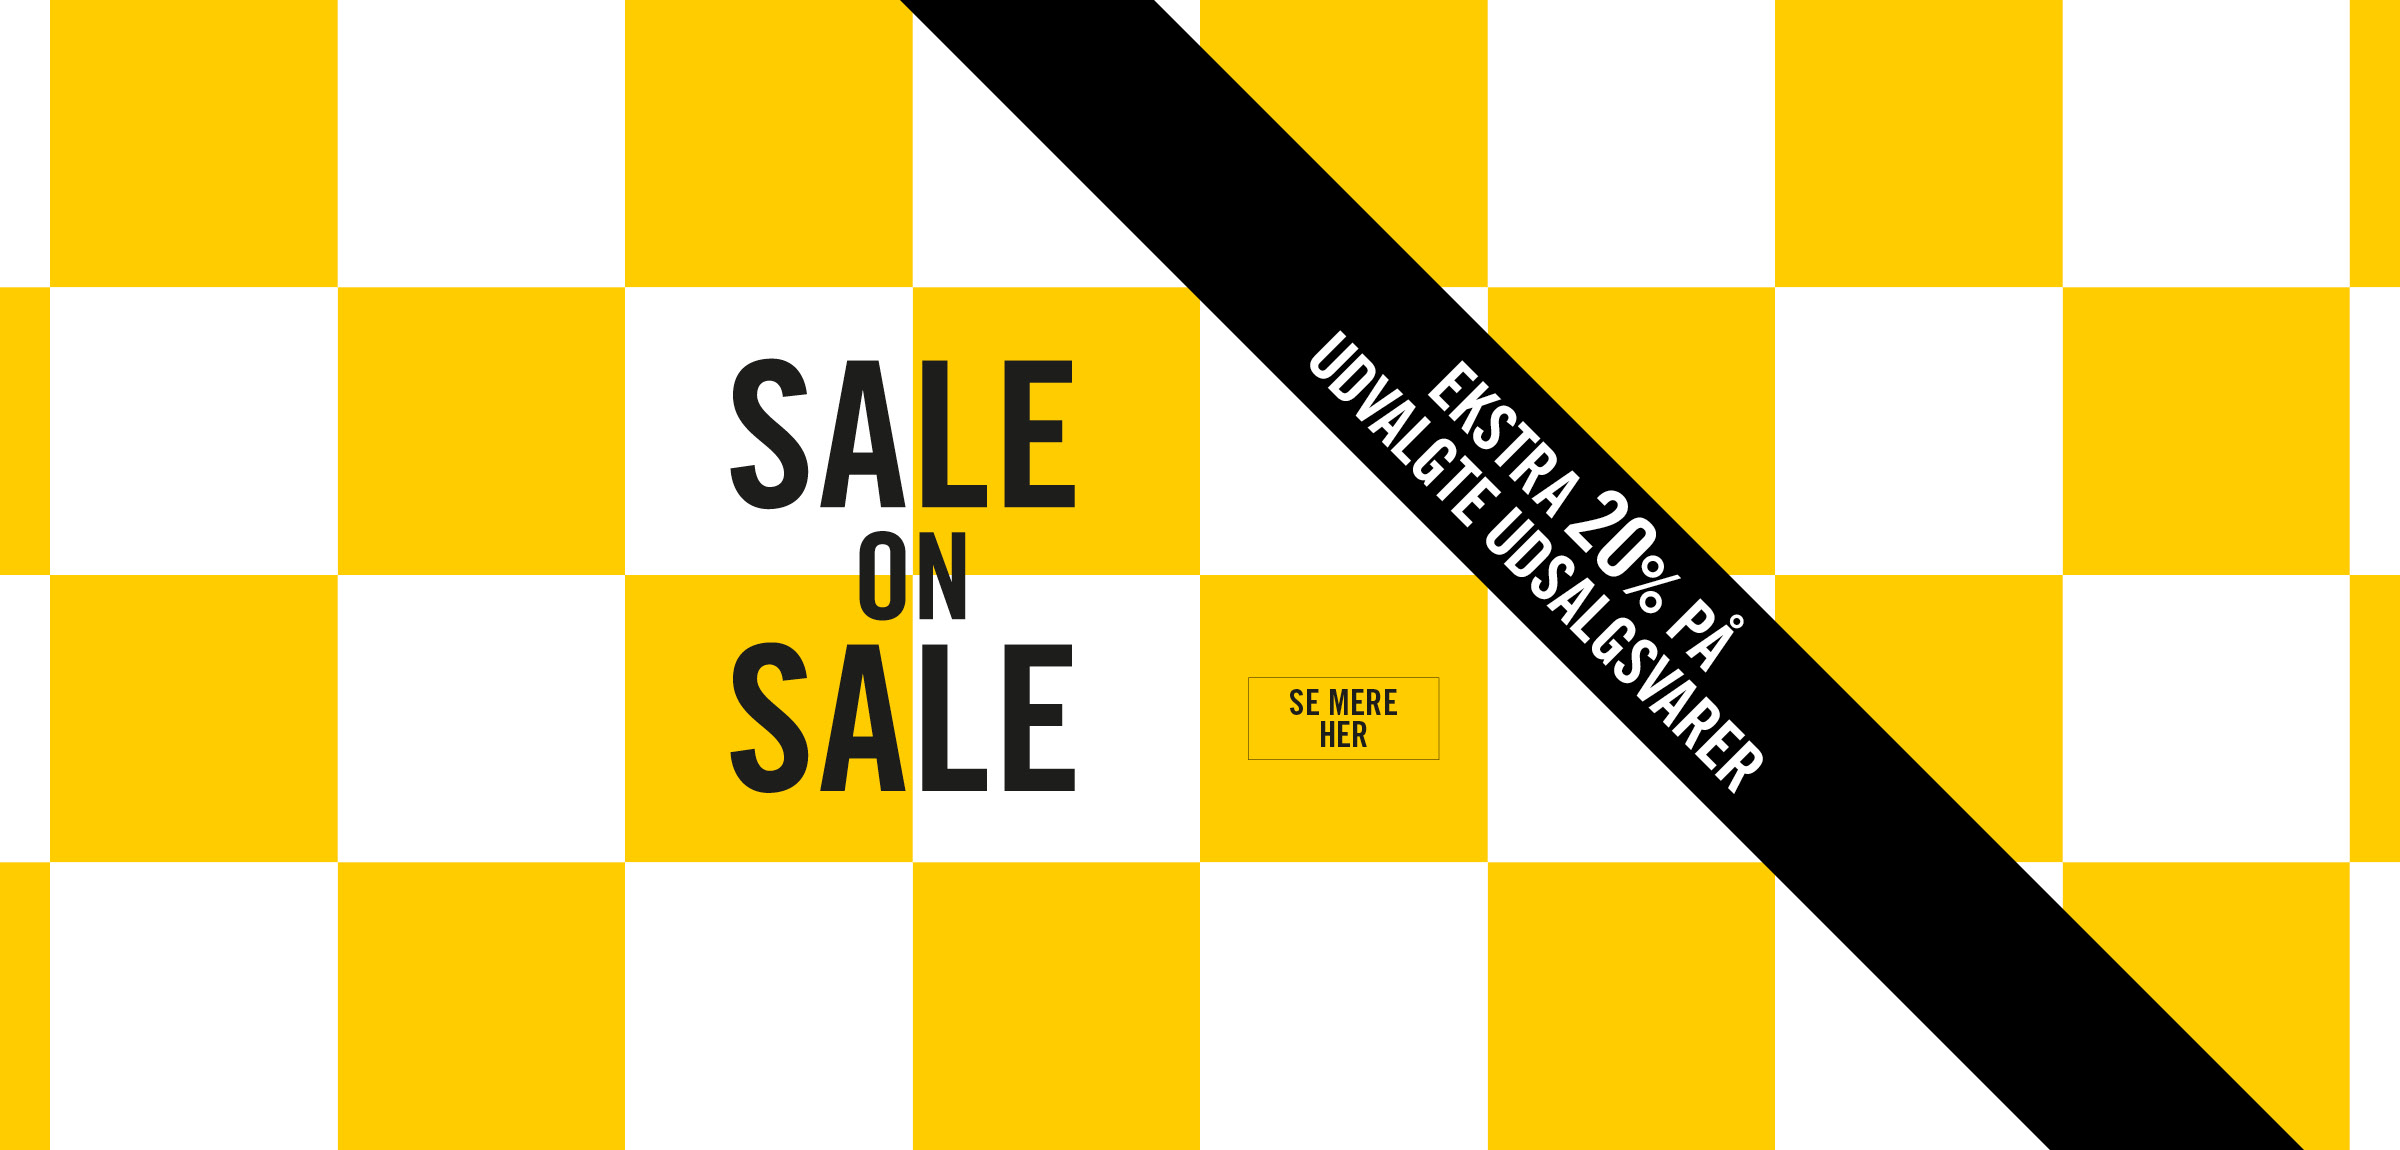 Illum Sale on sale forside